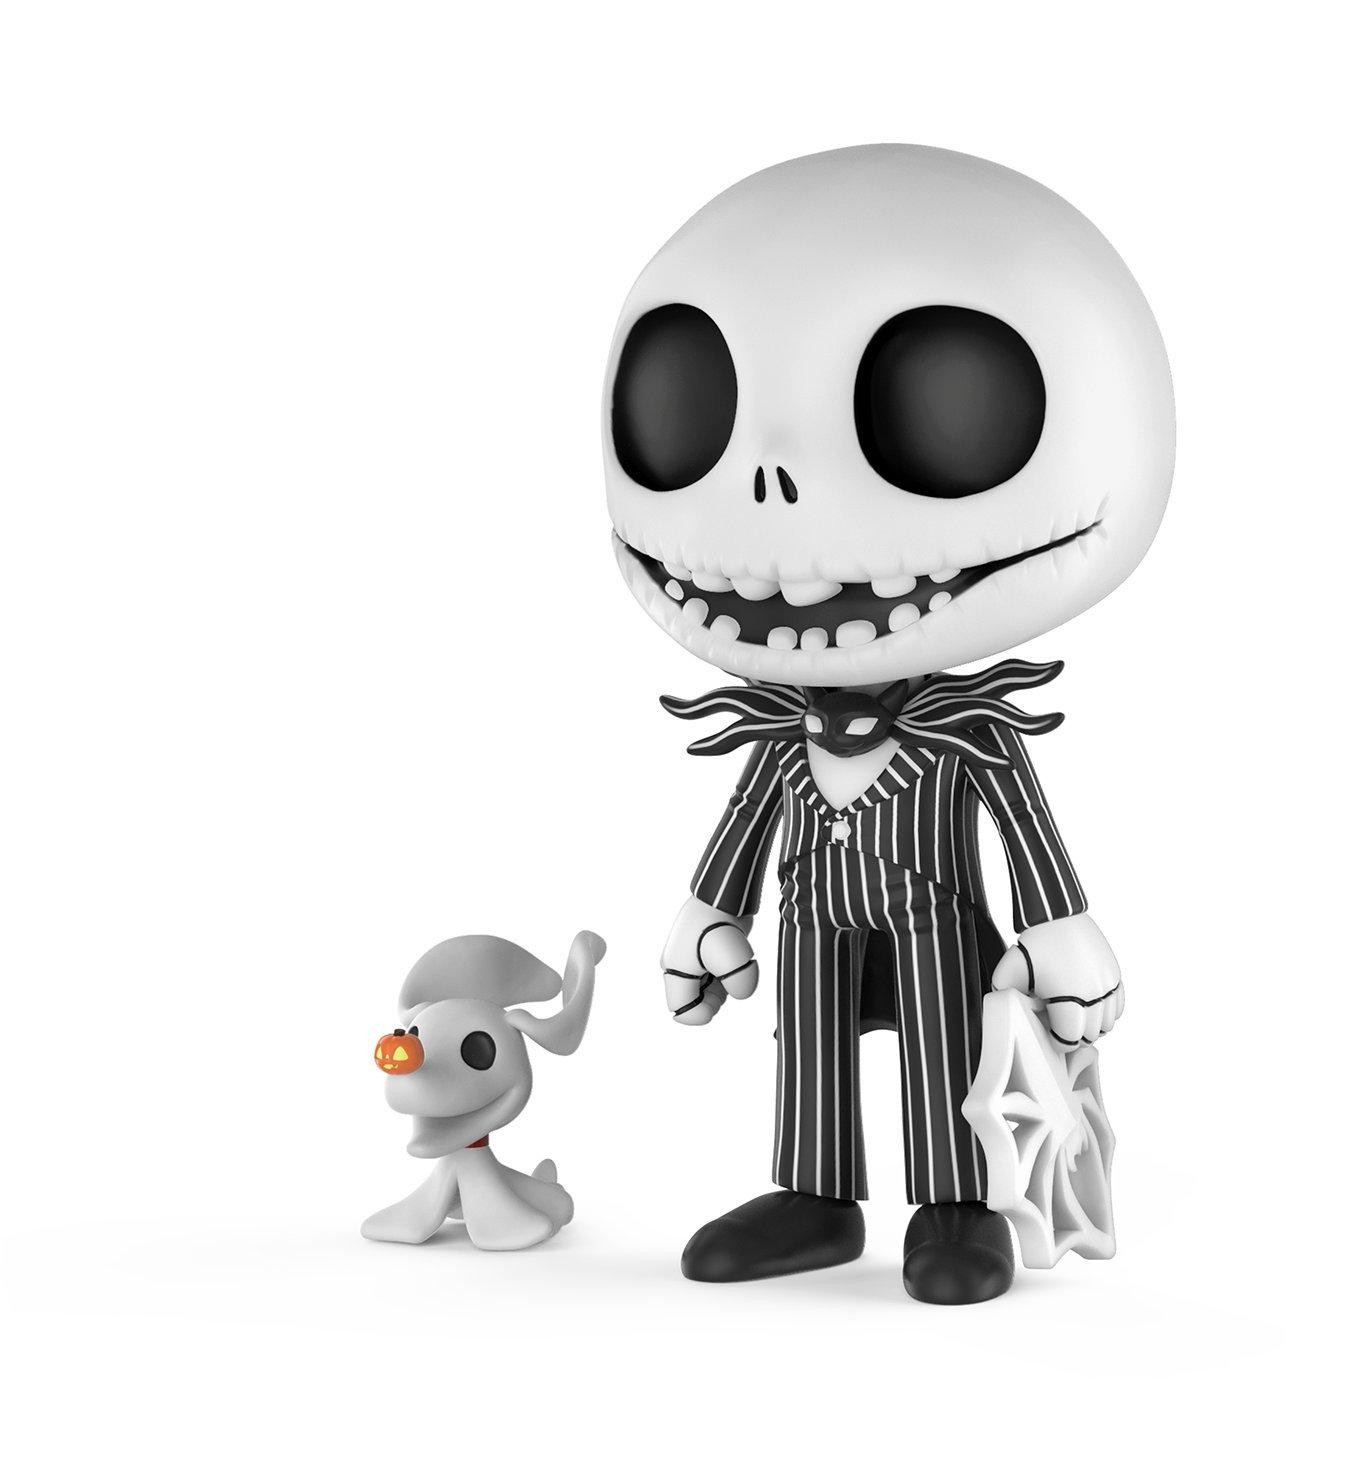 Amazon.com: Funko 5 Star: Nightmare Before Christmas - Jack ...